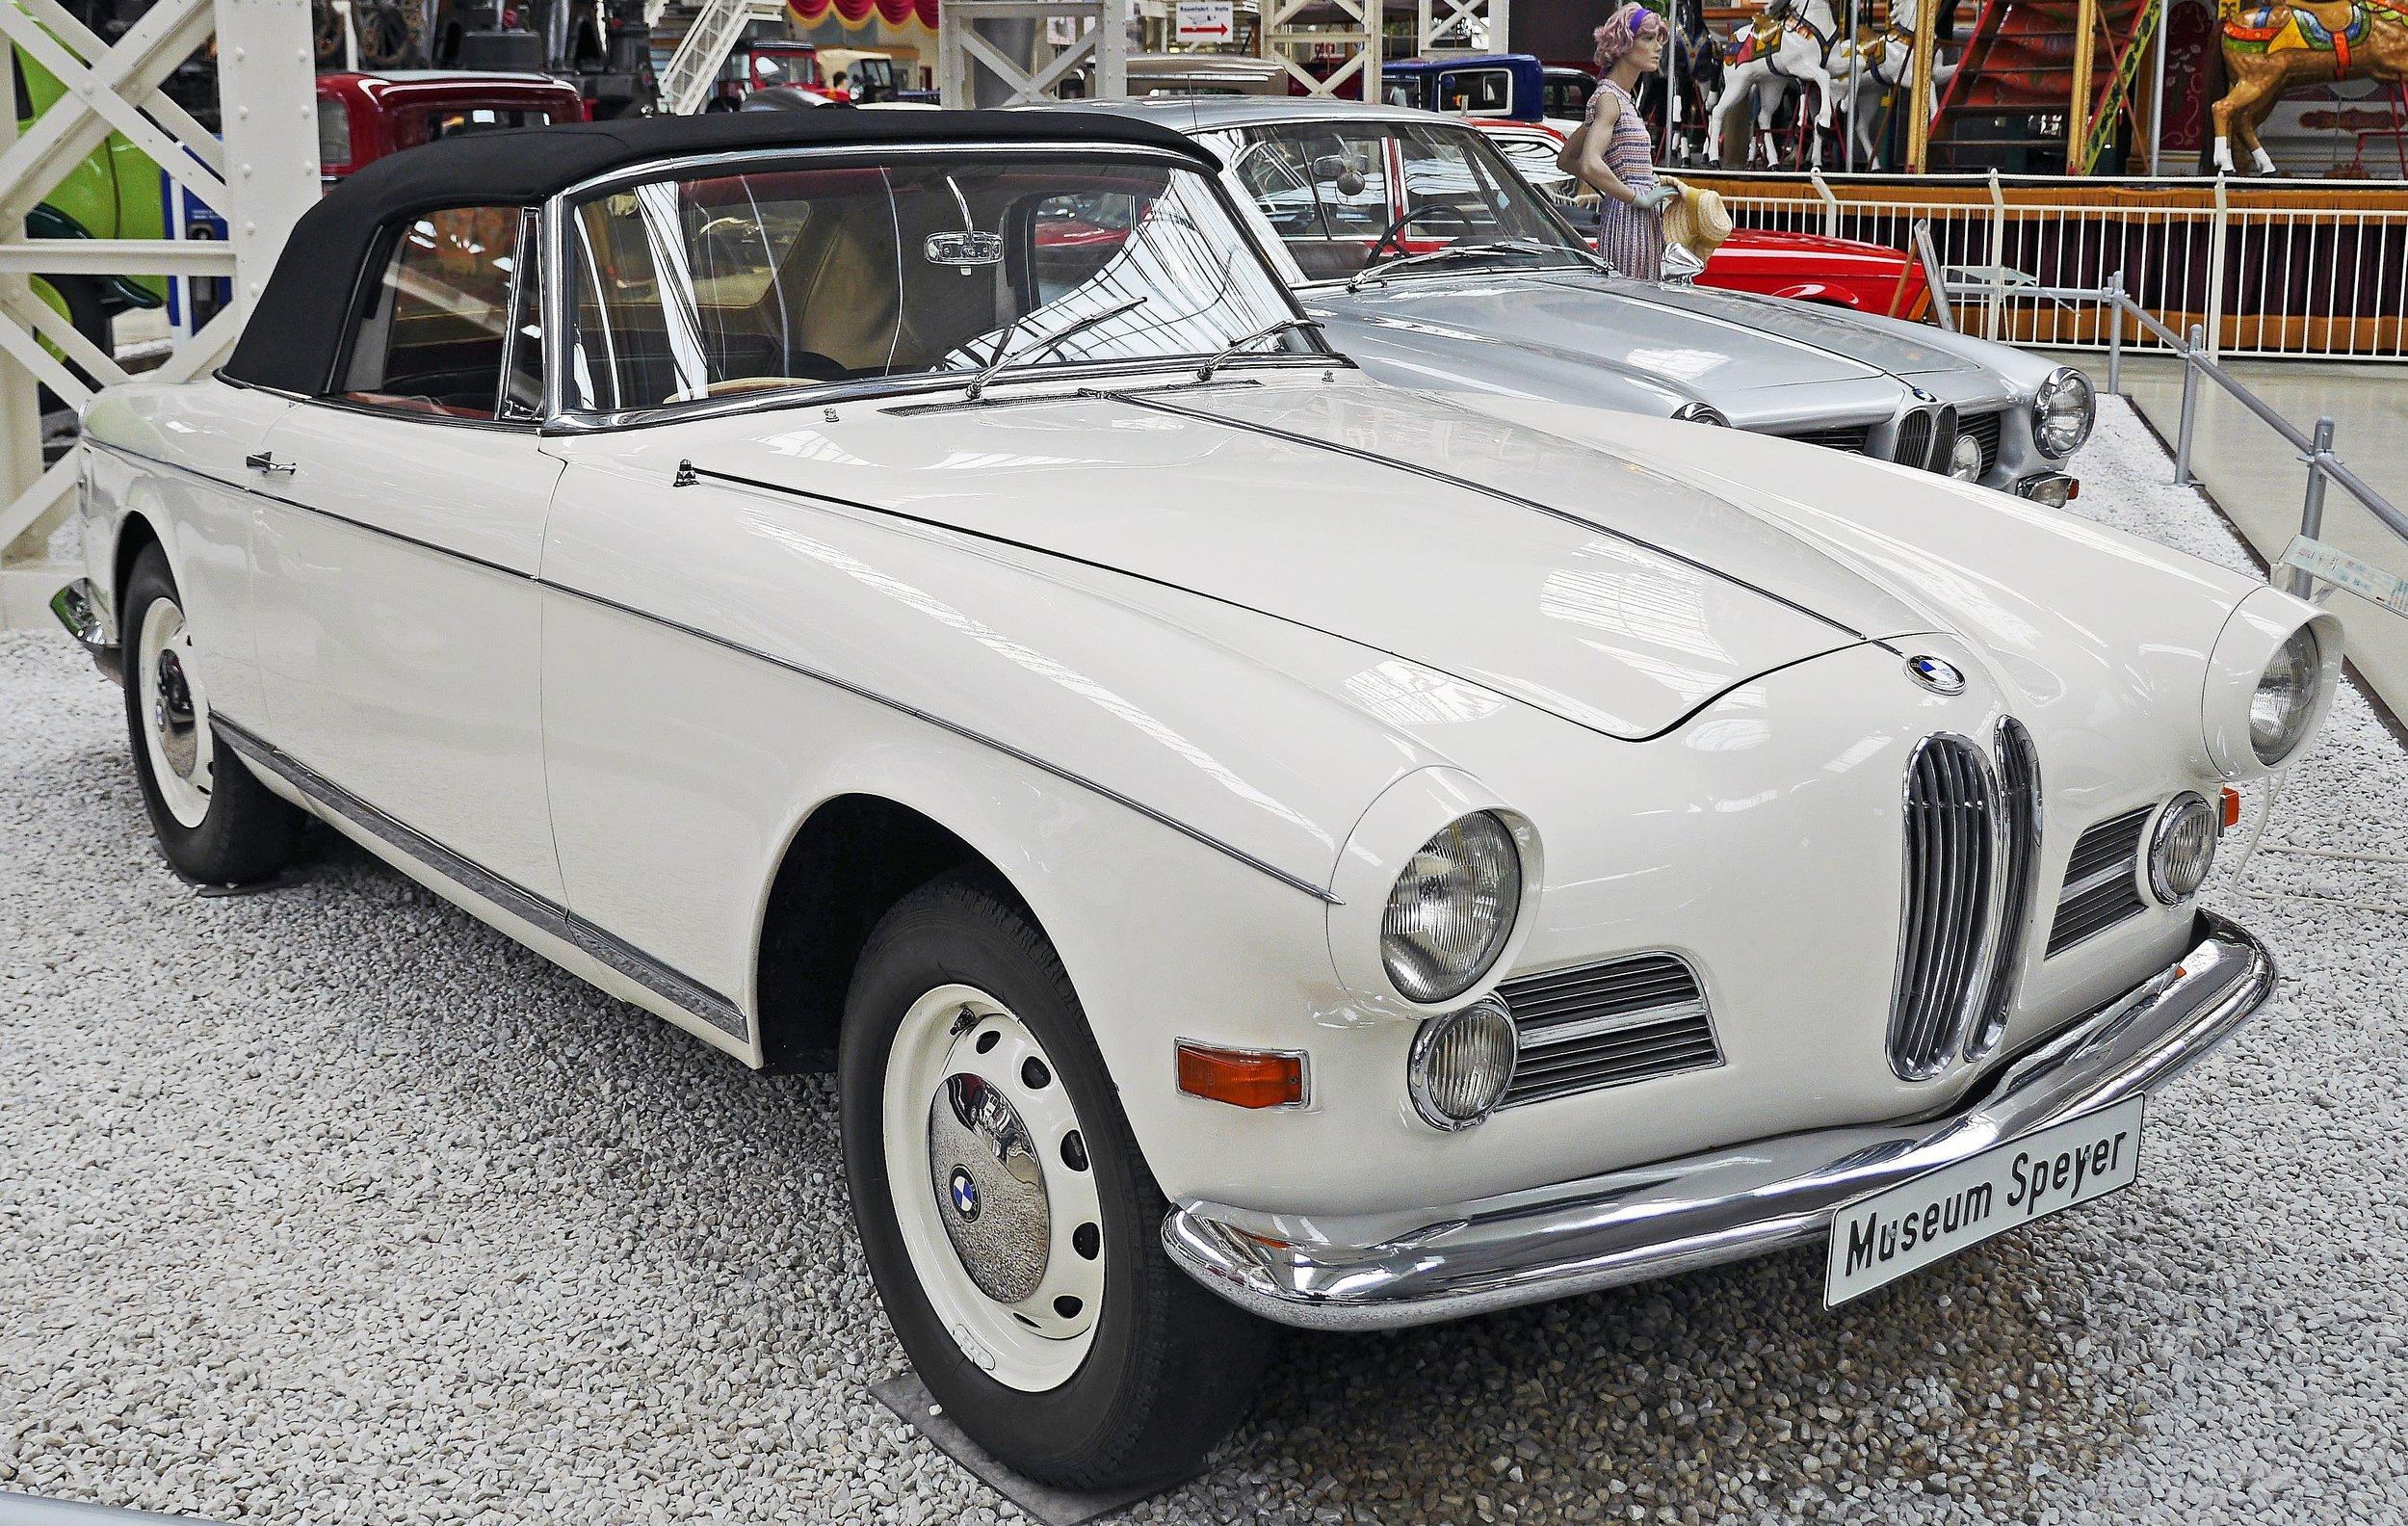 automobiles-automotive-car-show-208561.jpg